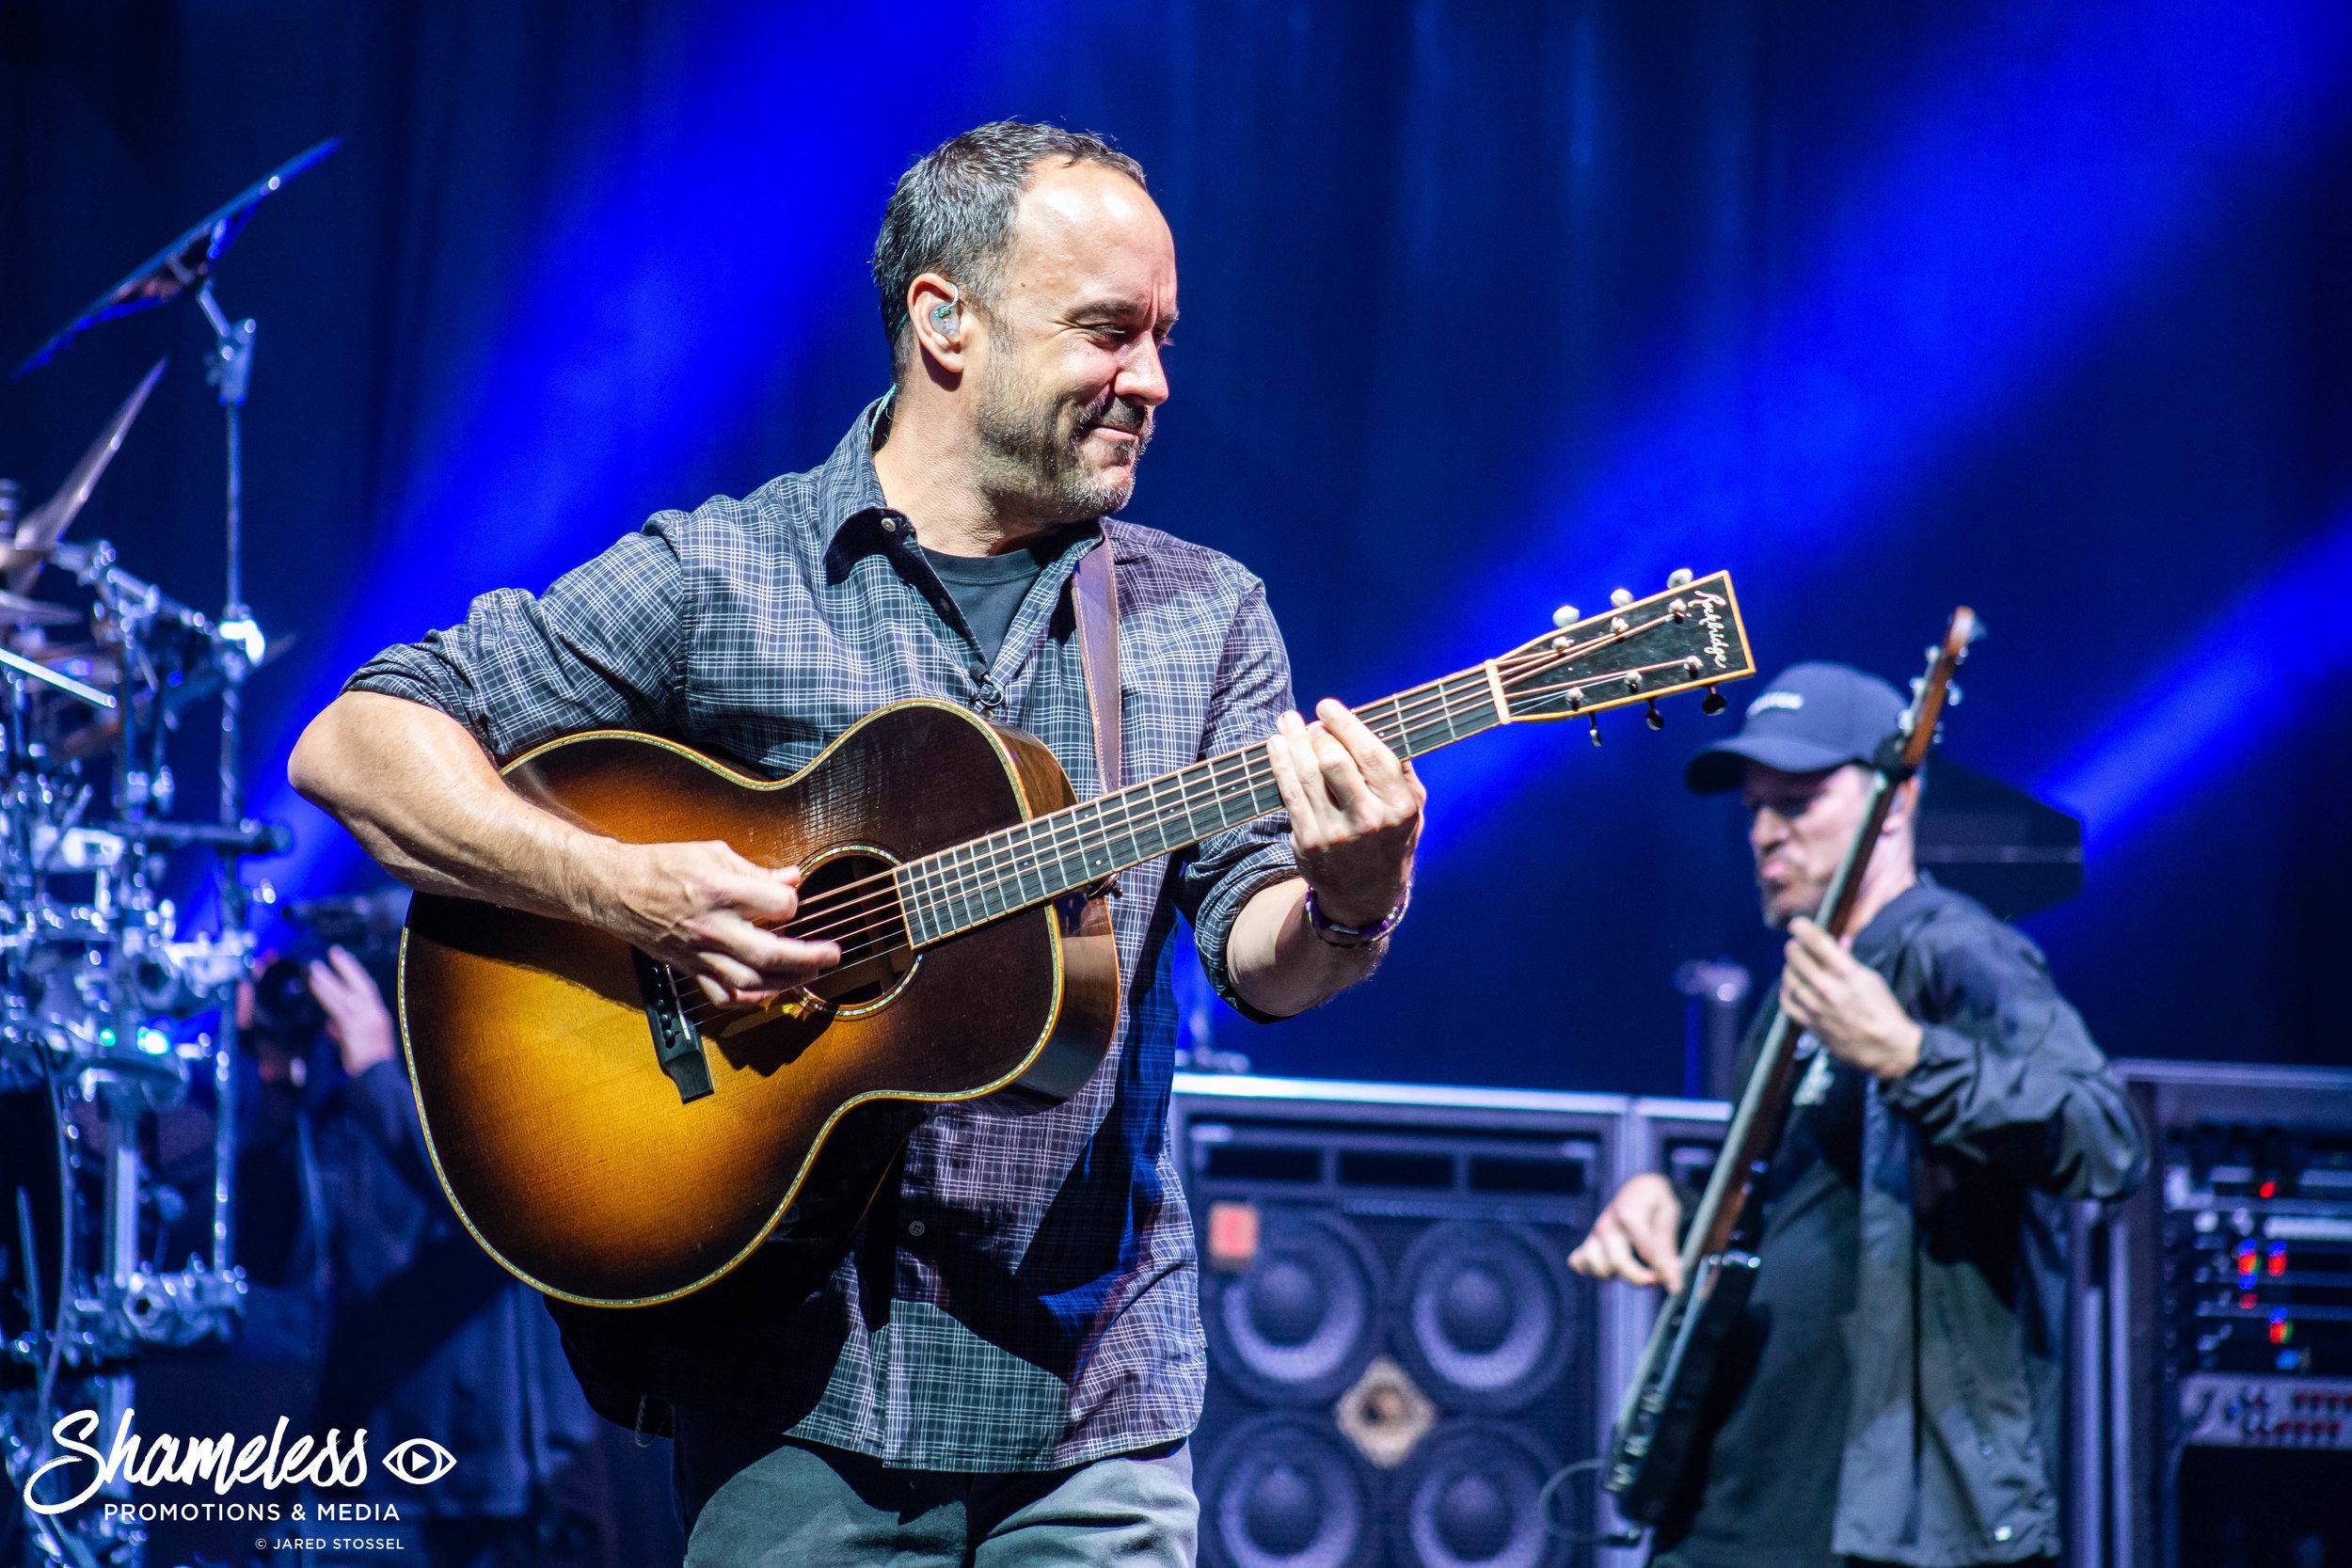 Dave Matthews Band @ Shoreline Amphitheatre: September 2018